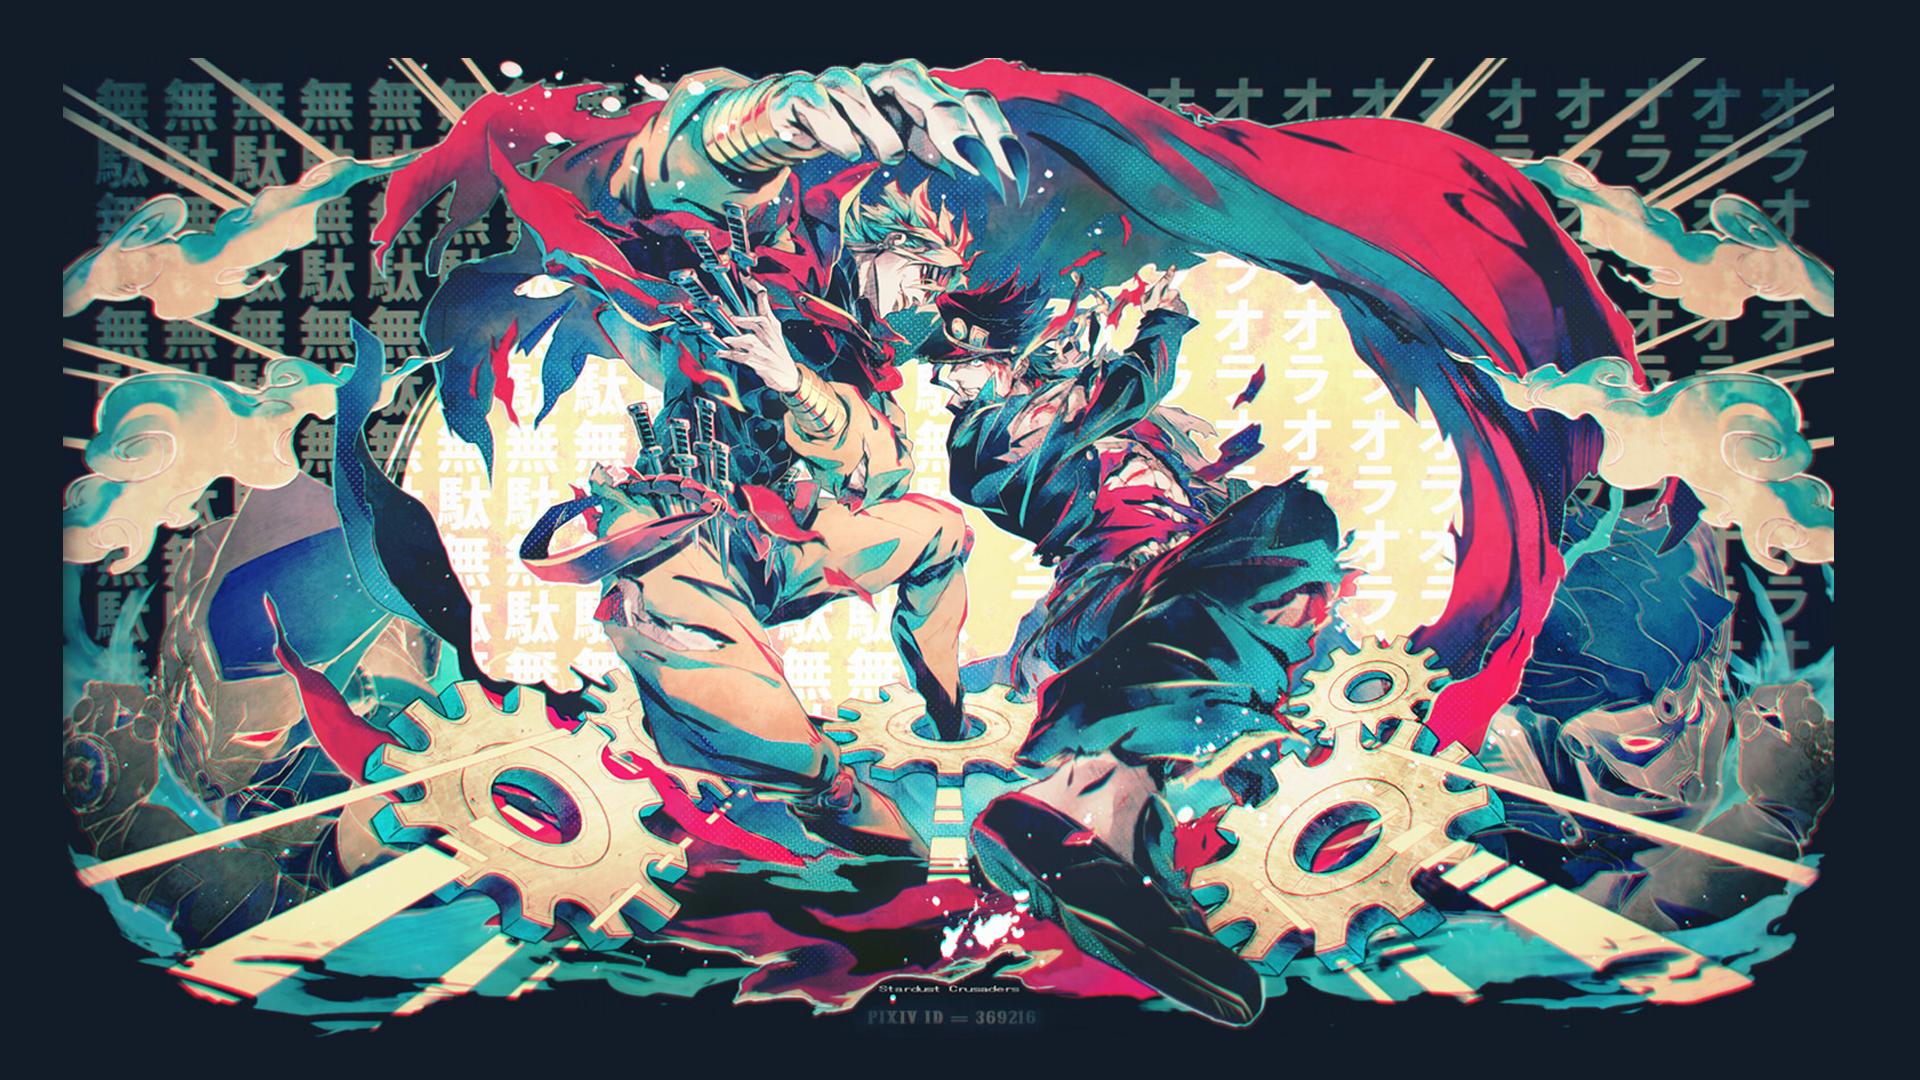 DIO / The World / Jotaro Kujo / Star Platinum / JoJo